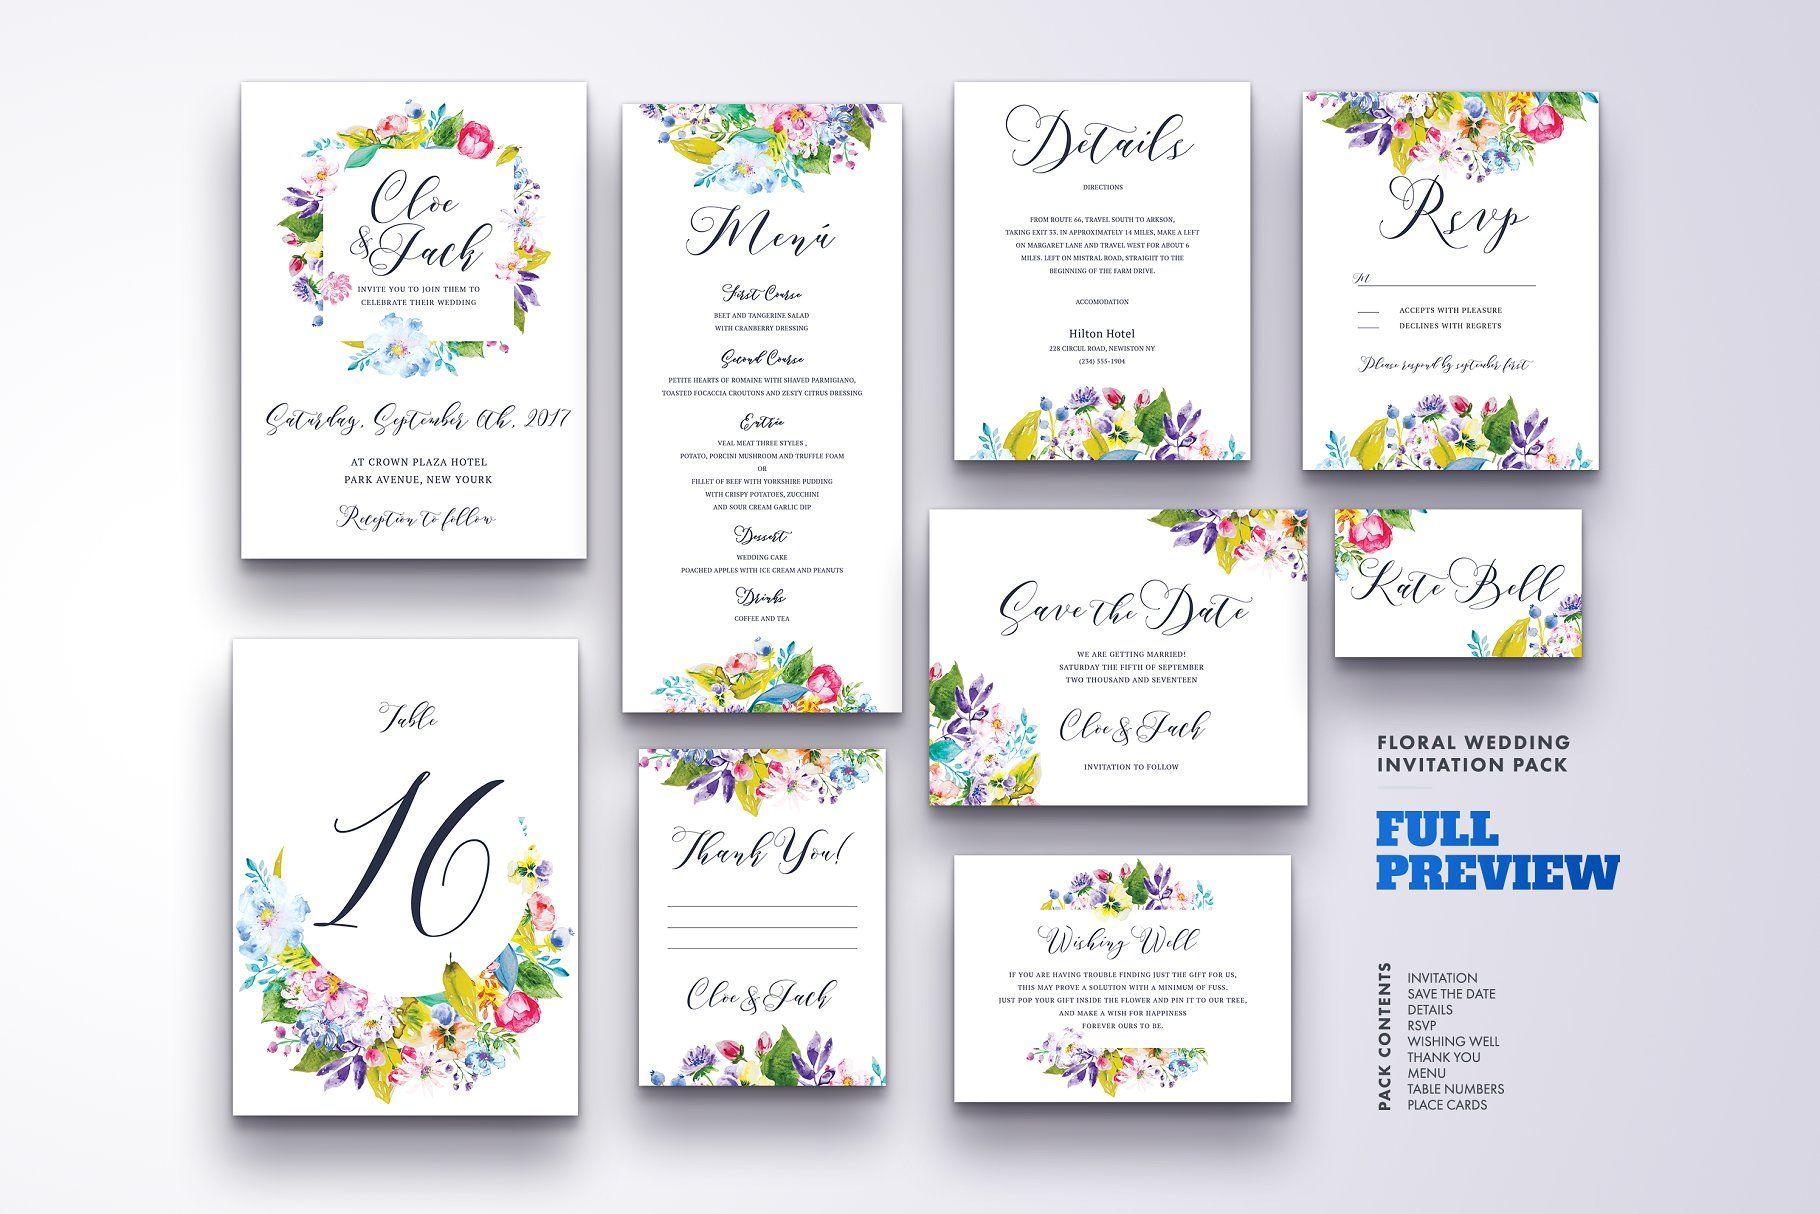 Floral Wedding Invitation Set Vol 3 Invitation Wedding Floral Templates Floral Wedding Invitations Wedding Invitations Flower Wedding Invitation